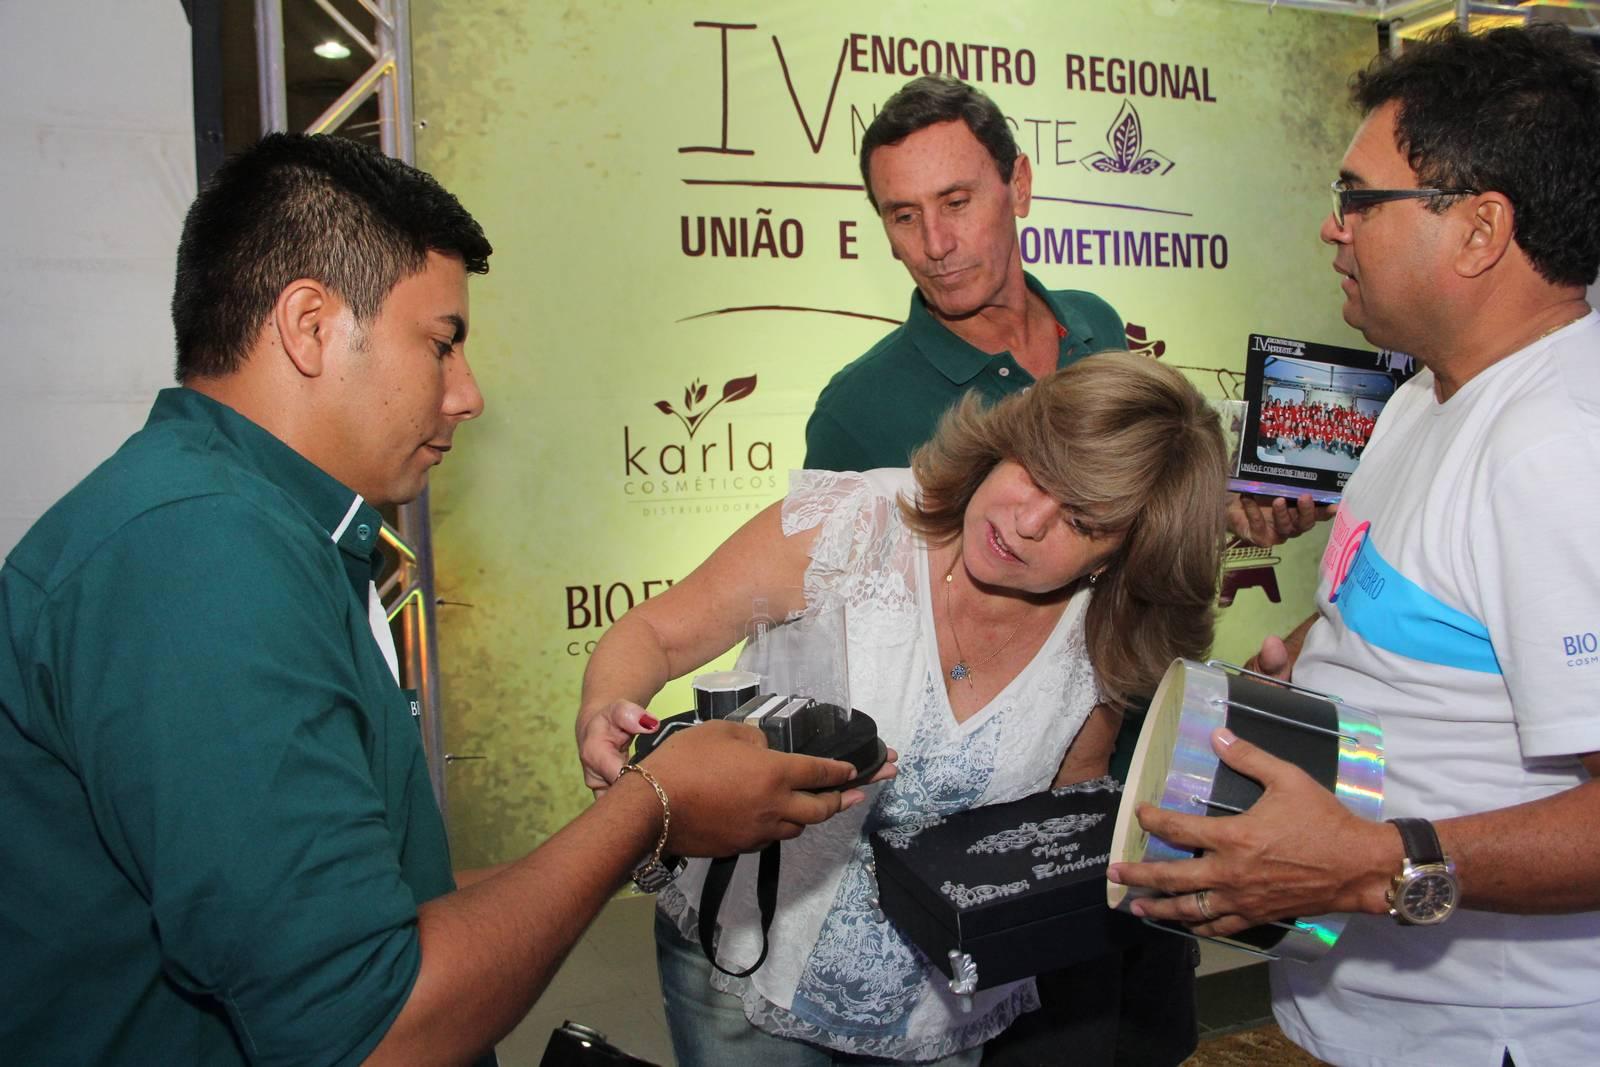 IV Encontro Regional do Nordeste - Bio Extratus (335)